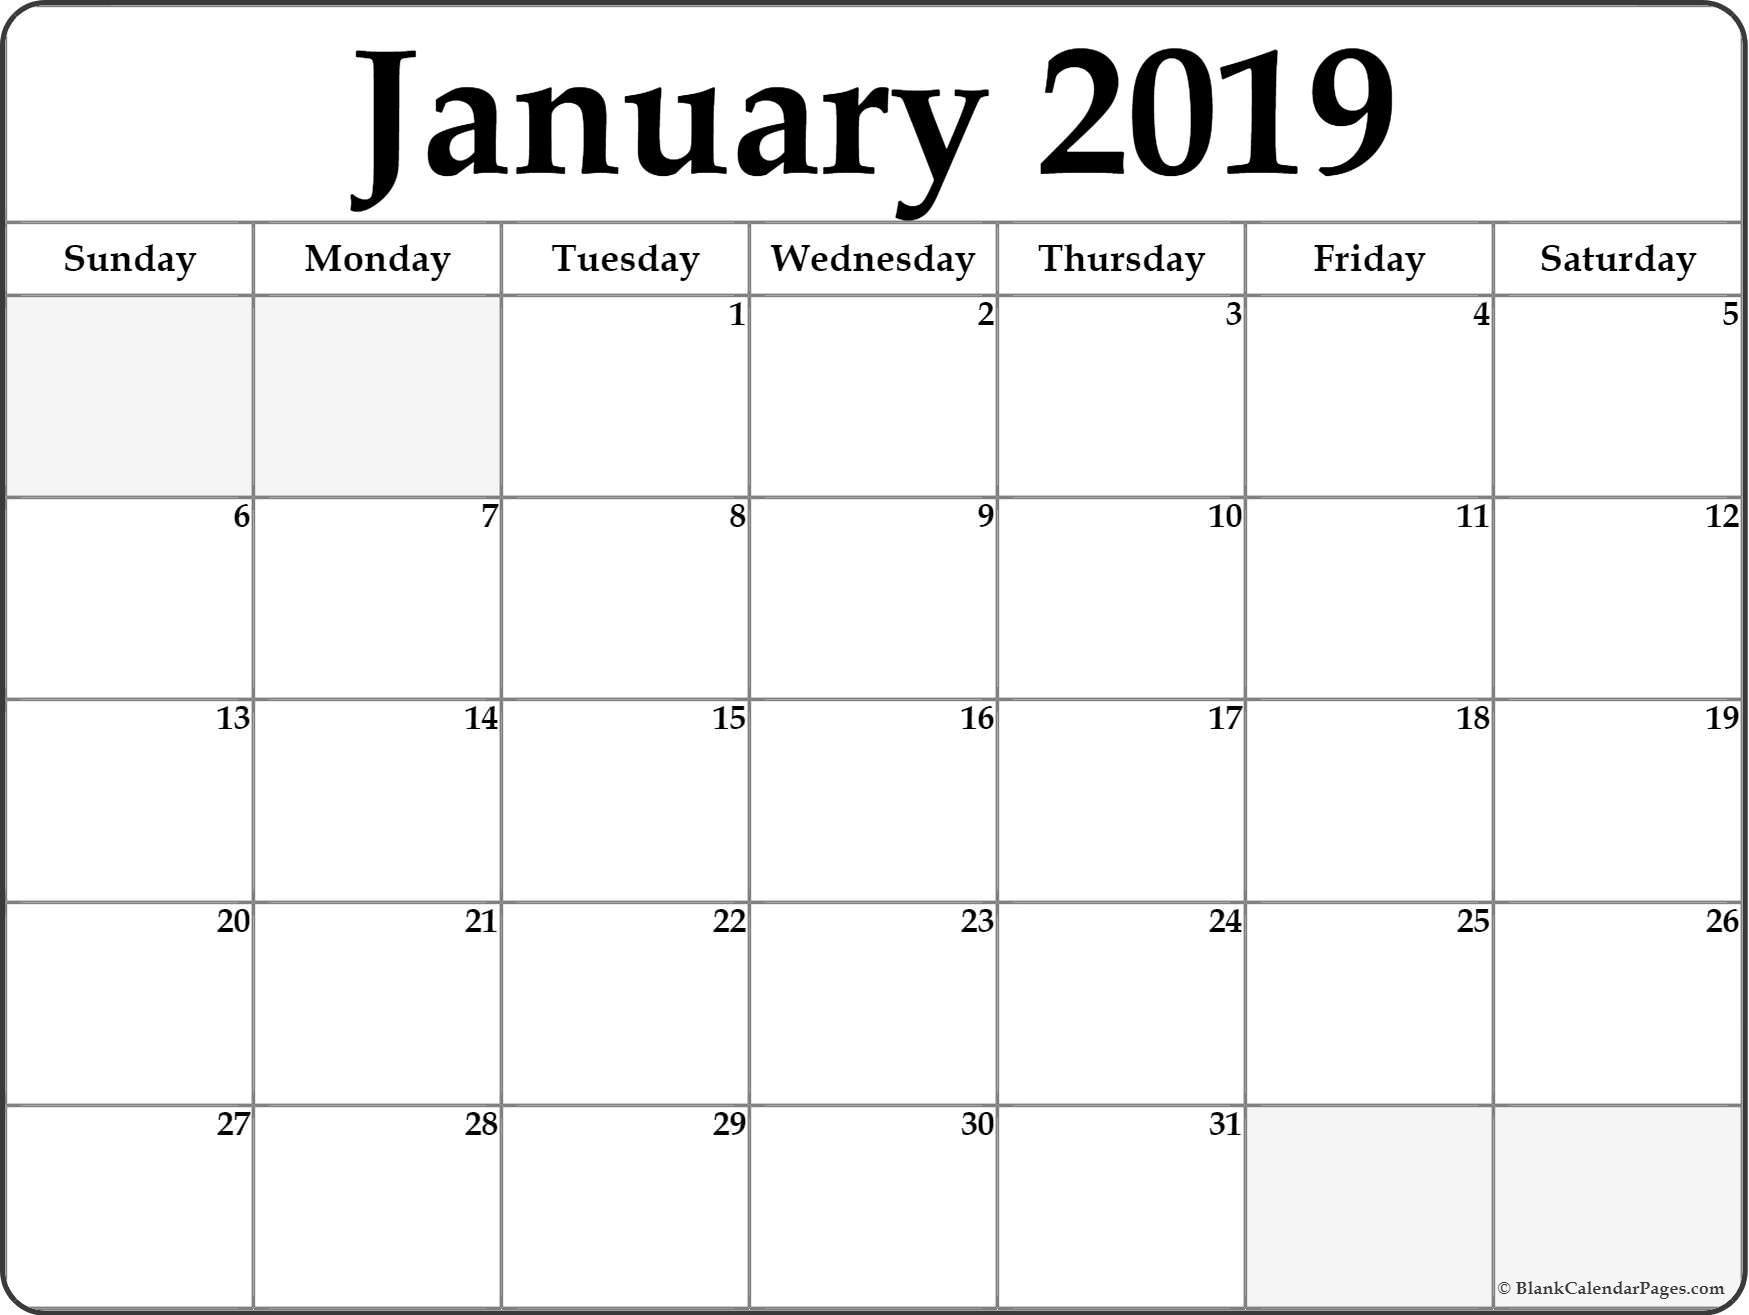 January 2019 Calendar Landscape | Printable Blank Calendar